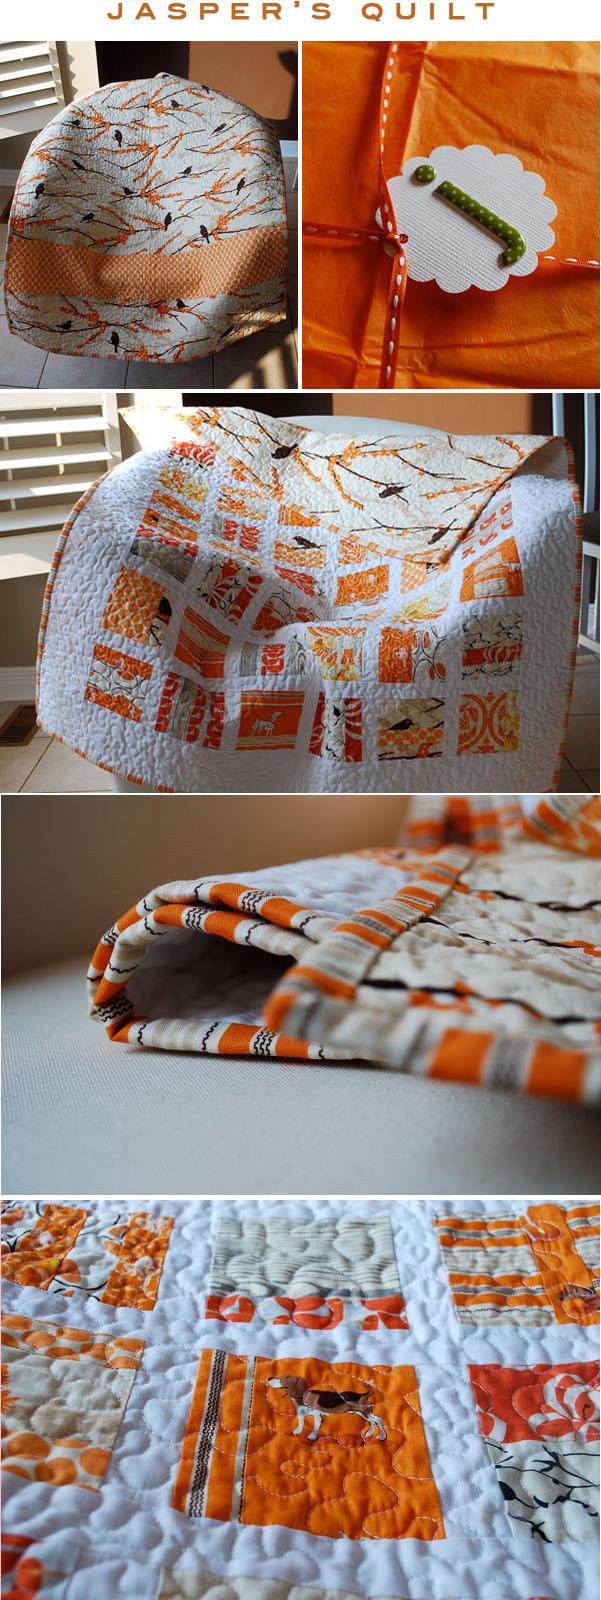 Jaspers quilt